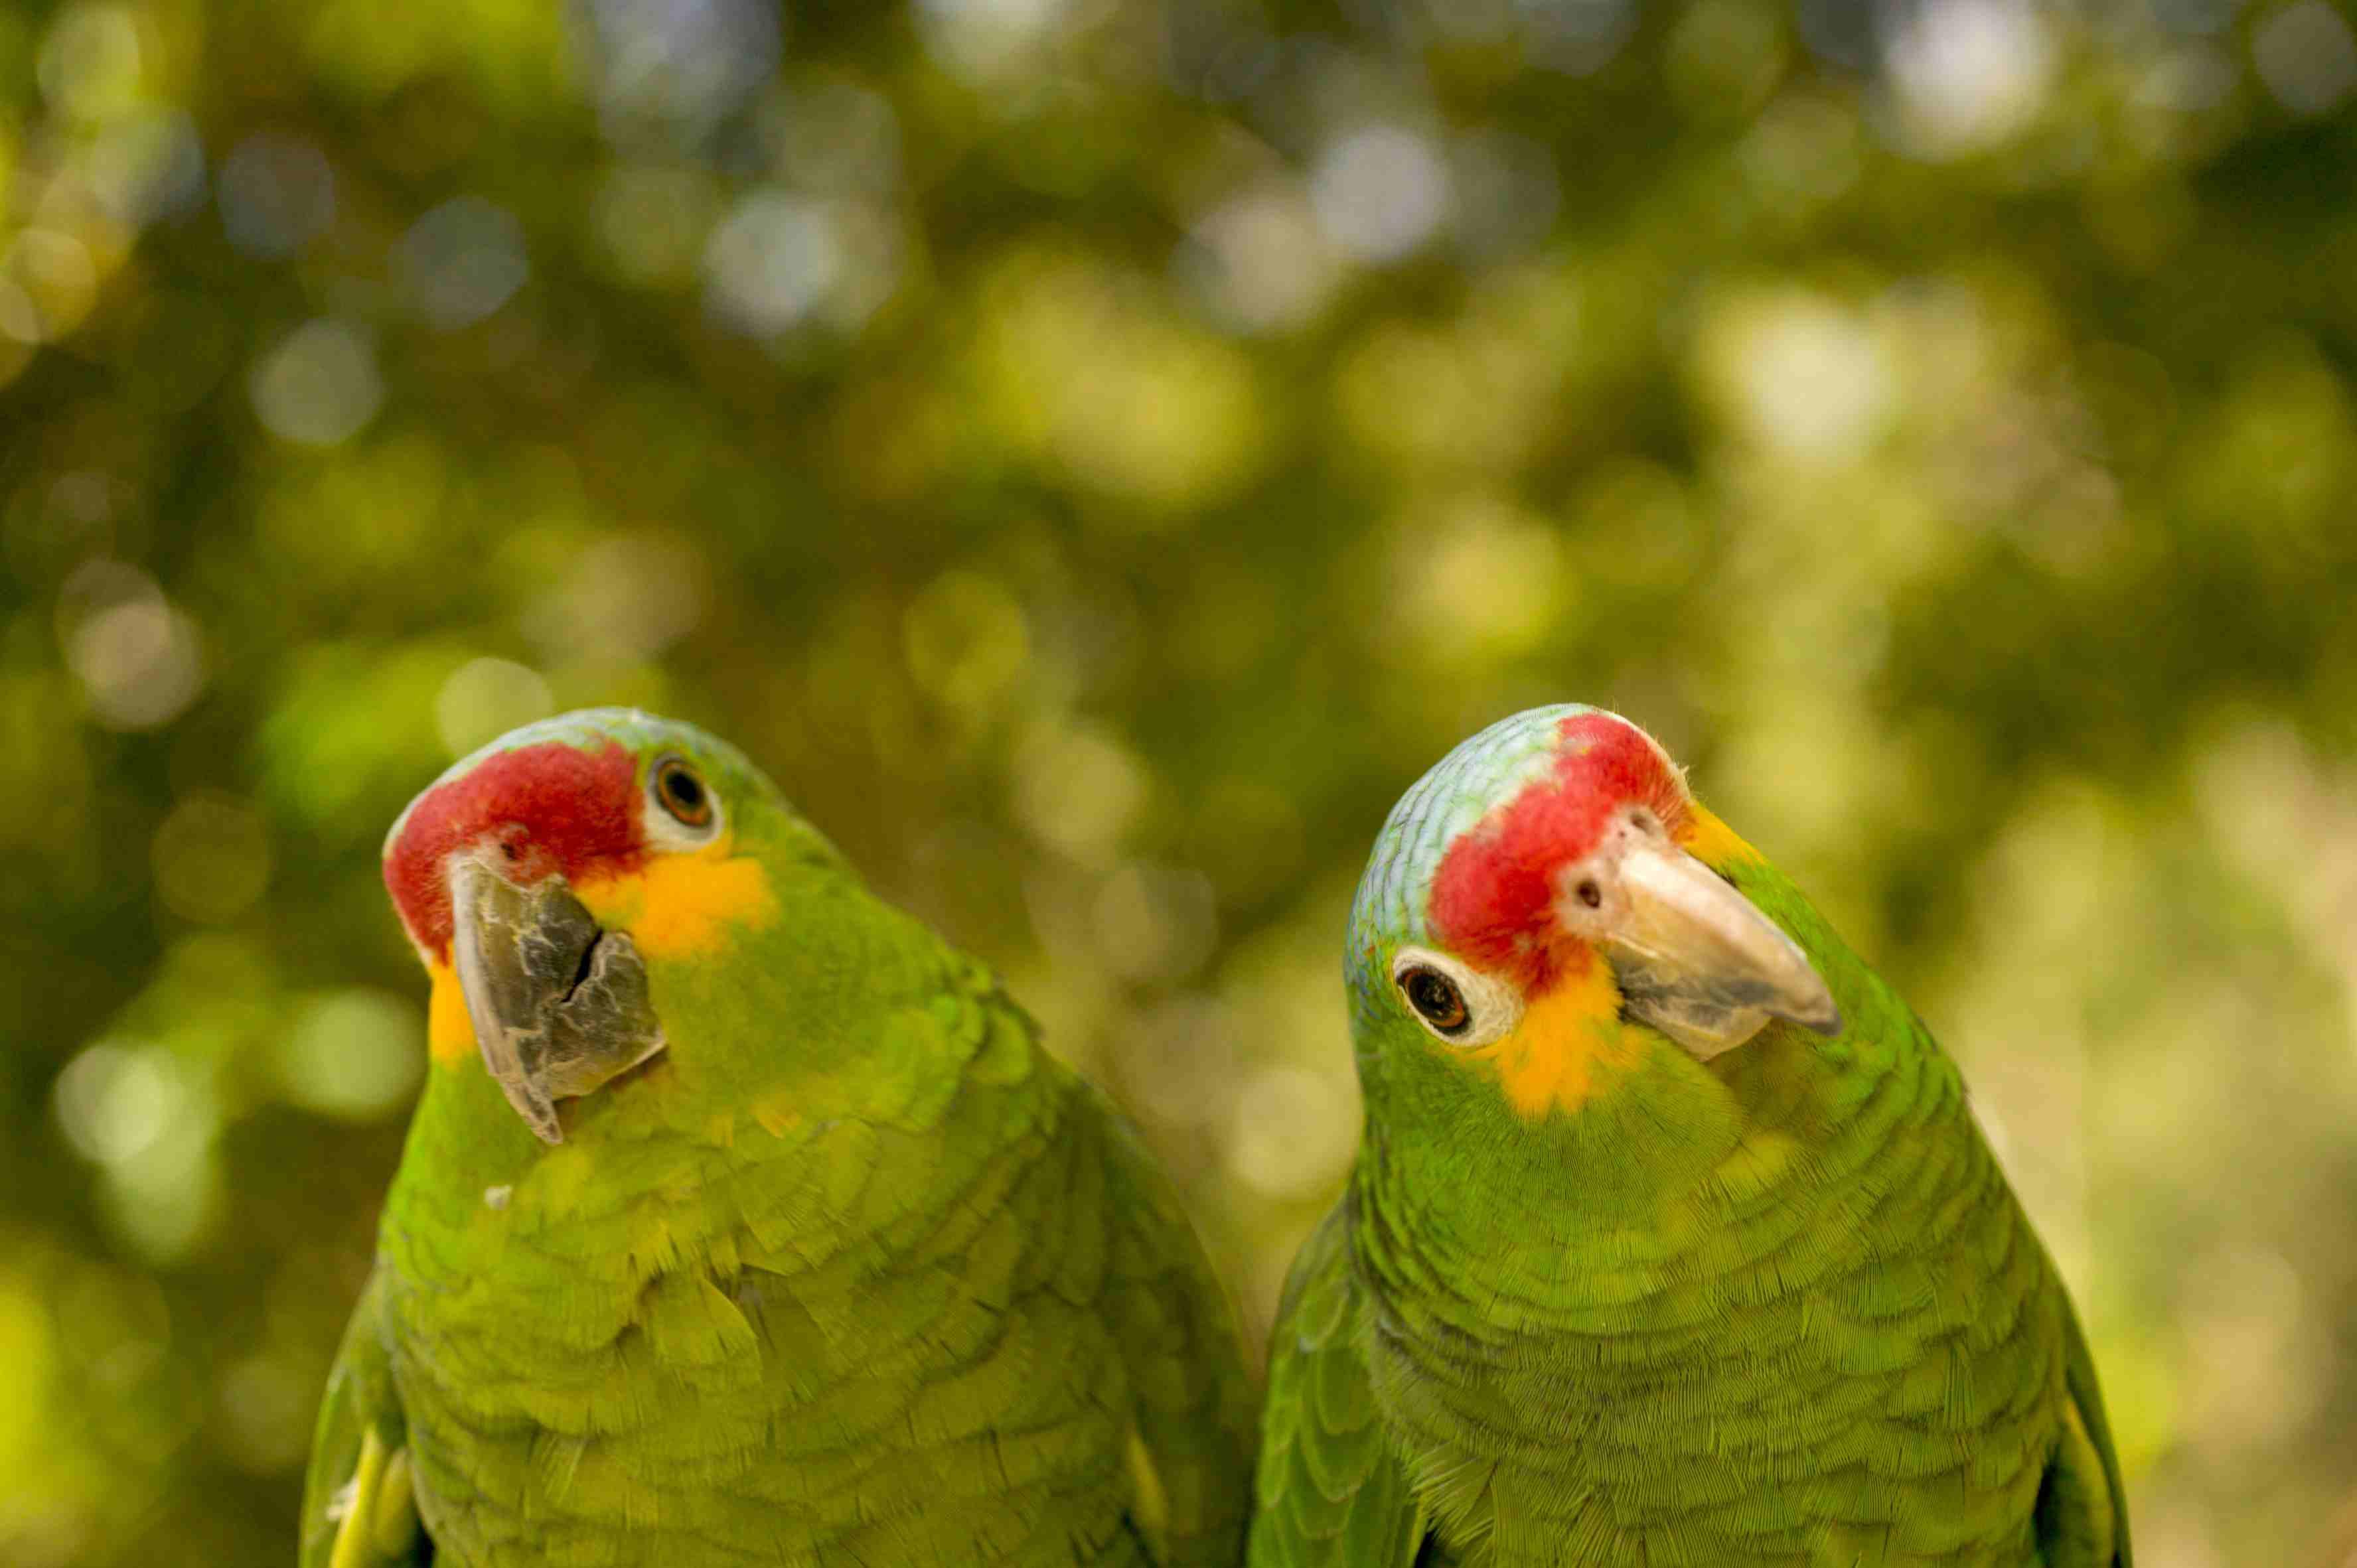 Red-lored Amazon (Amazona autumnalus) pair, close-up